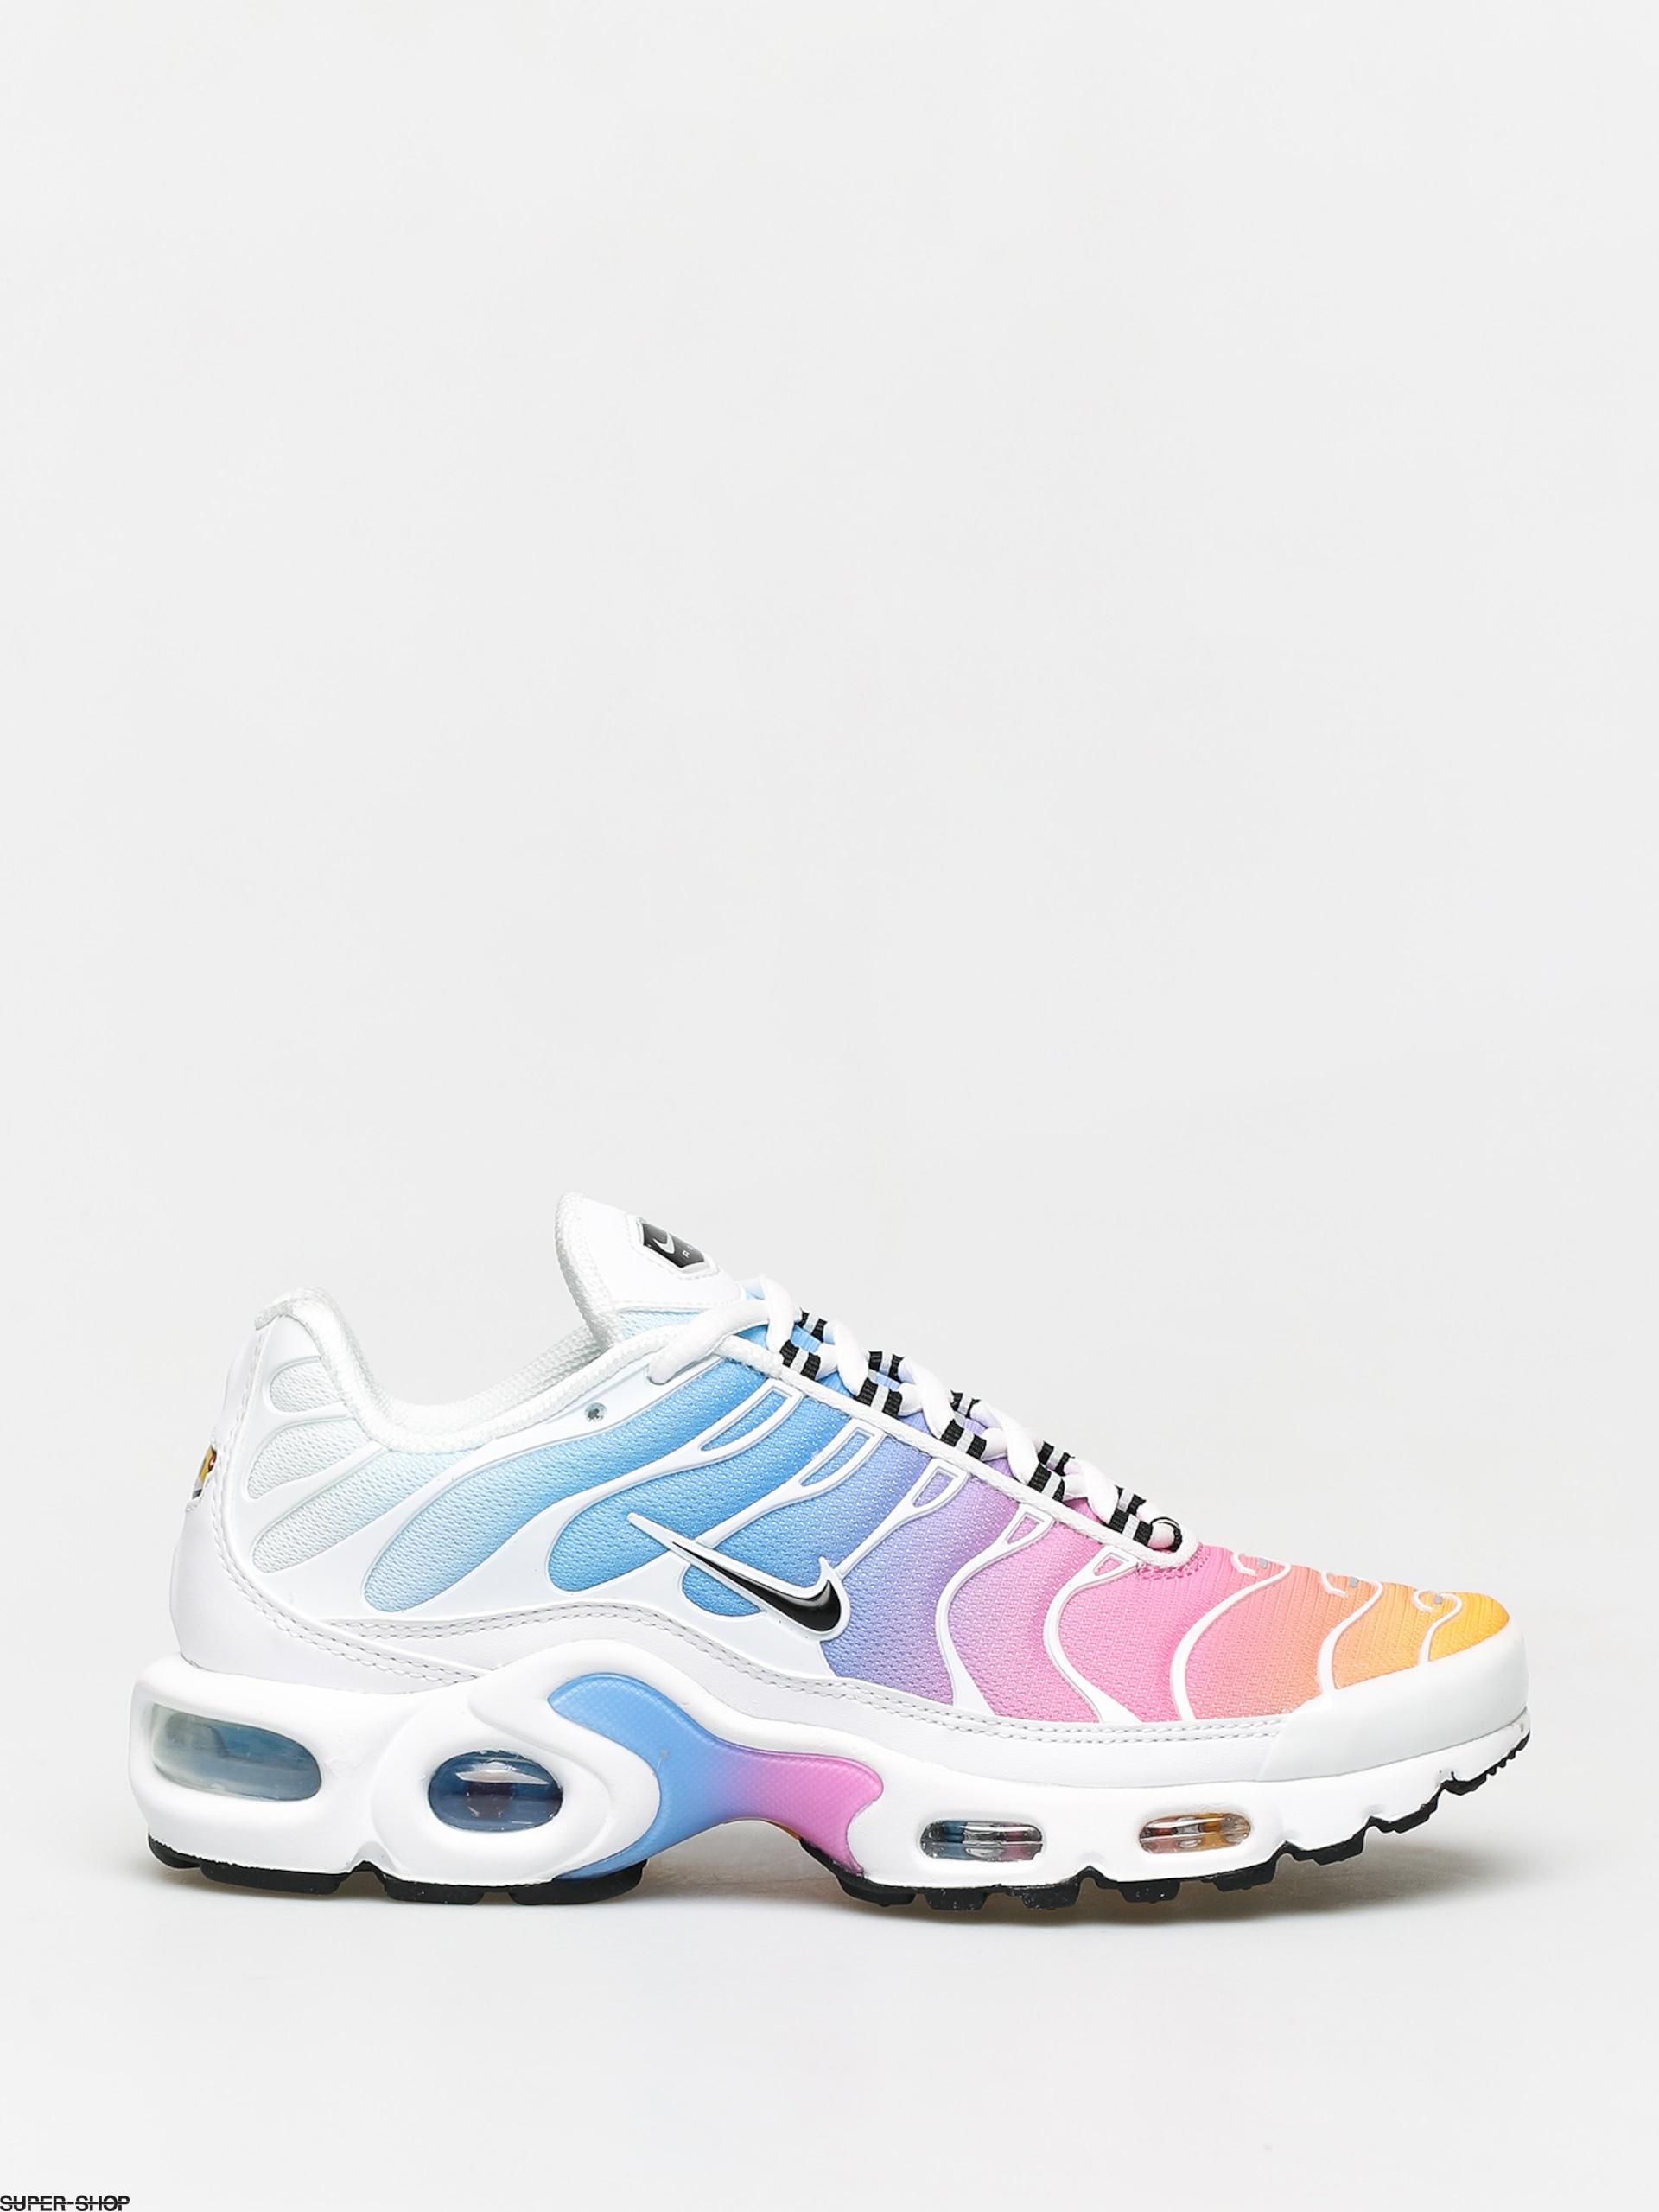 Nike Air Max Plus Blue Pink | 605112